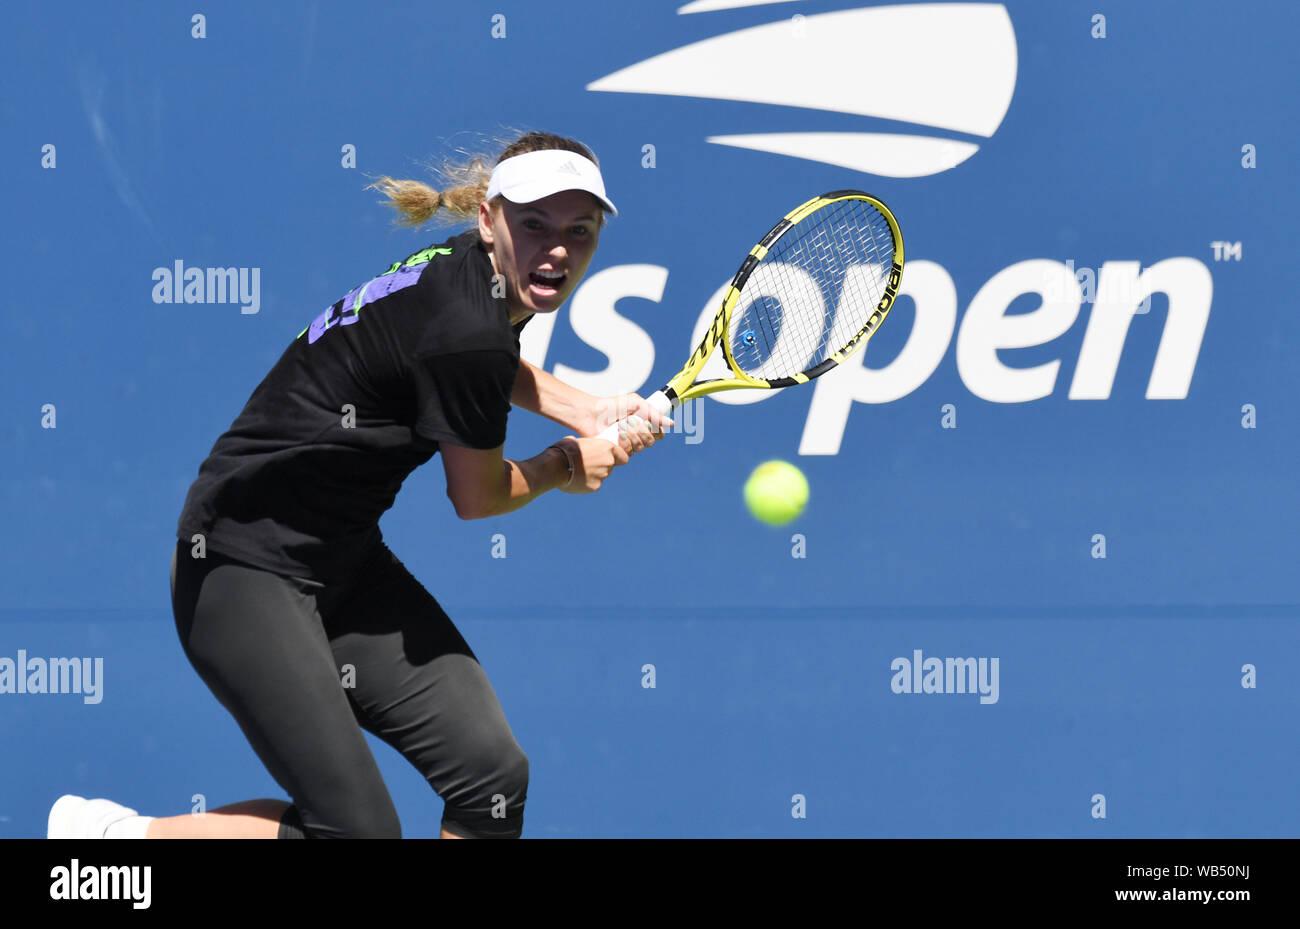 New York, USA. 24th Aug, 2019. Flushing Meadows New York US Open Tennis Caroline Wozniacki (DEN) practices on Louis Armstong Court Credit: Roger Parker/Alamy Live News Stock Photo